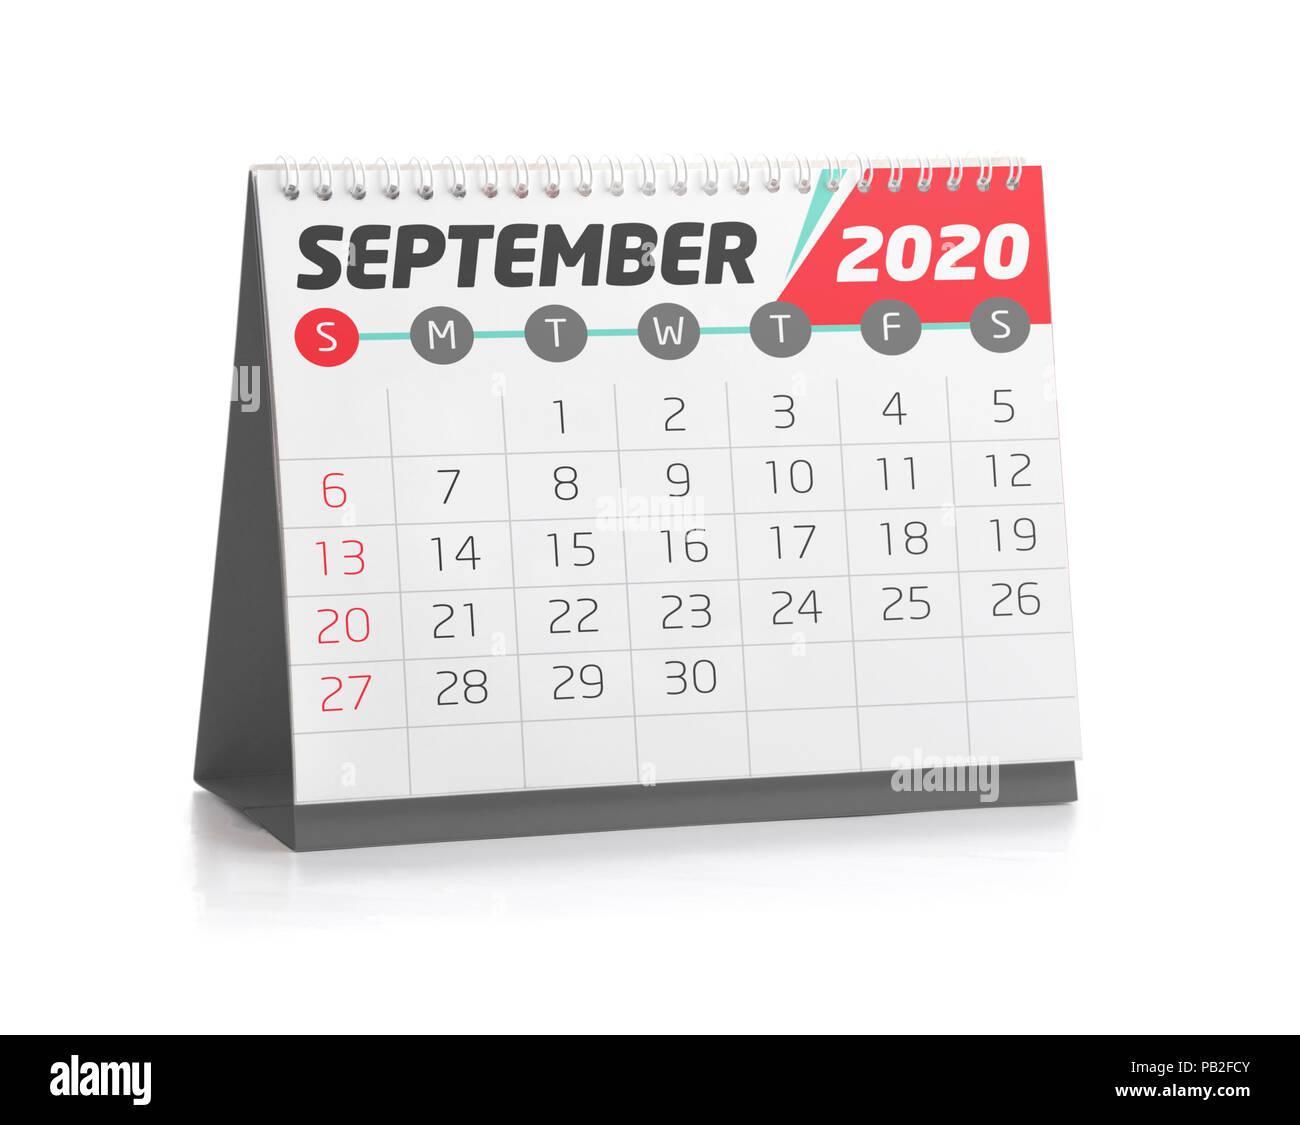 Calendrier De Septembre 2020.Calendrier De Bureau Blanc Septembre 2020 Isolated On White